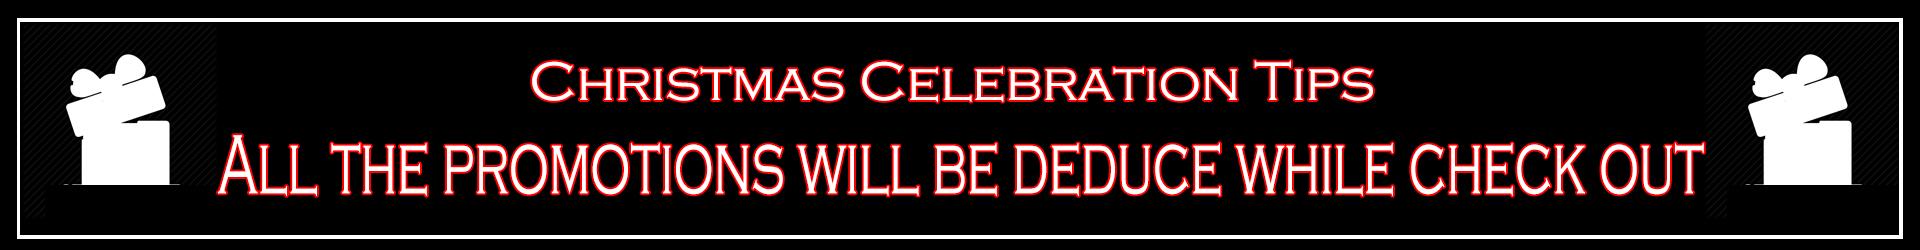 france, chateaulaguiole, ADV, 酒鼻子, 香檳刀, 侍酒刀, 耶誕節, 聖誕節, merry, christmas, gift, engrave, 刻字, 手工, 高級, highclass,